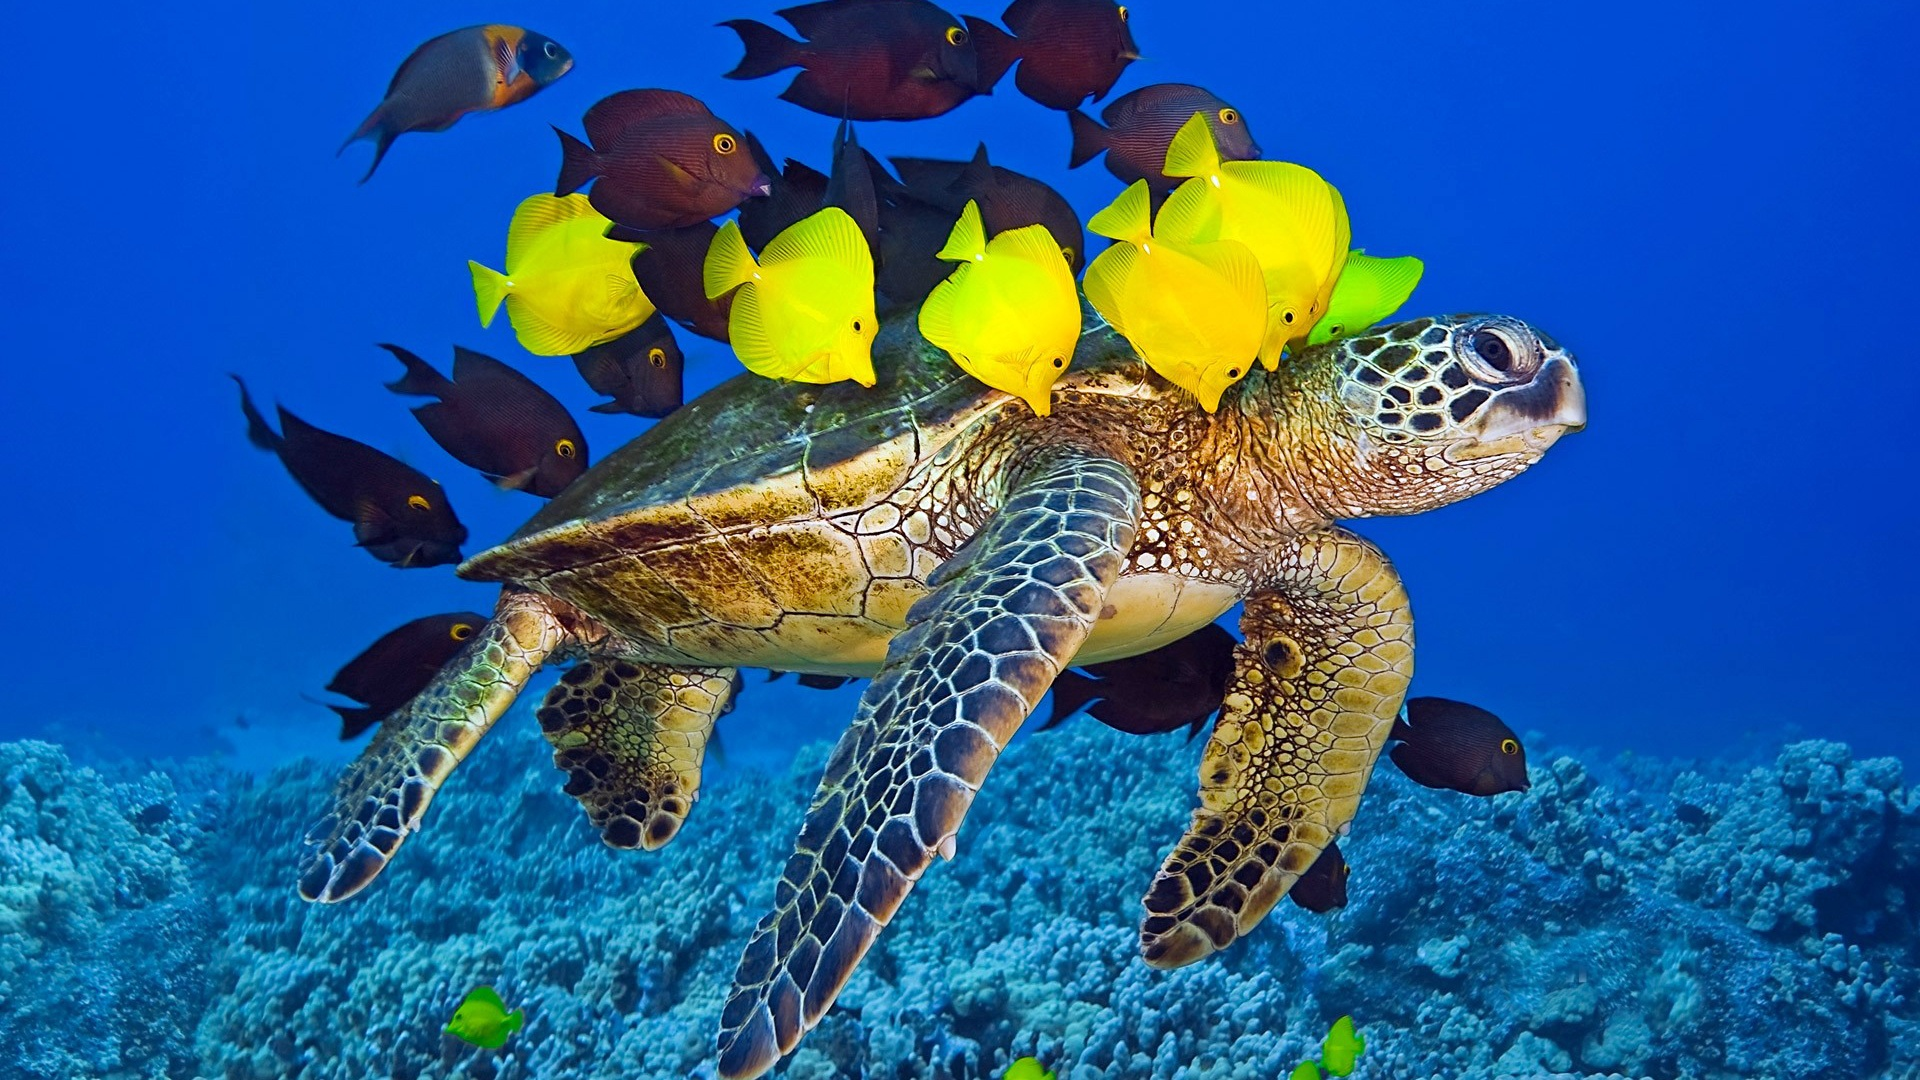 Sea turtle ocean underwater yellow and brown fish Wallpaper Desktop 1920x1080